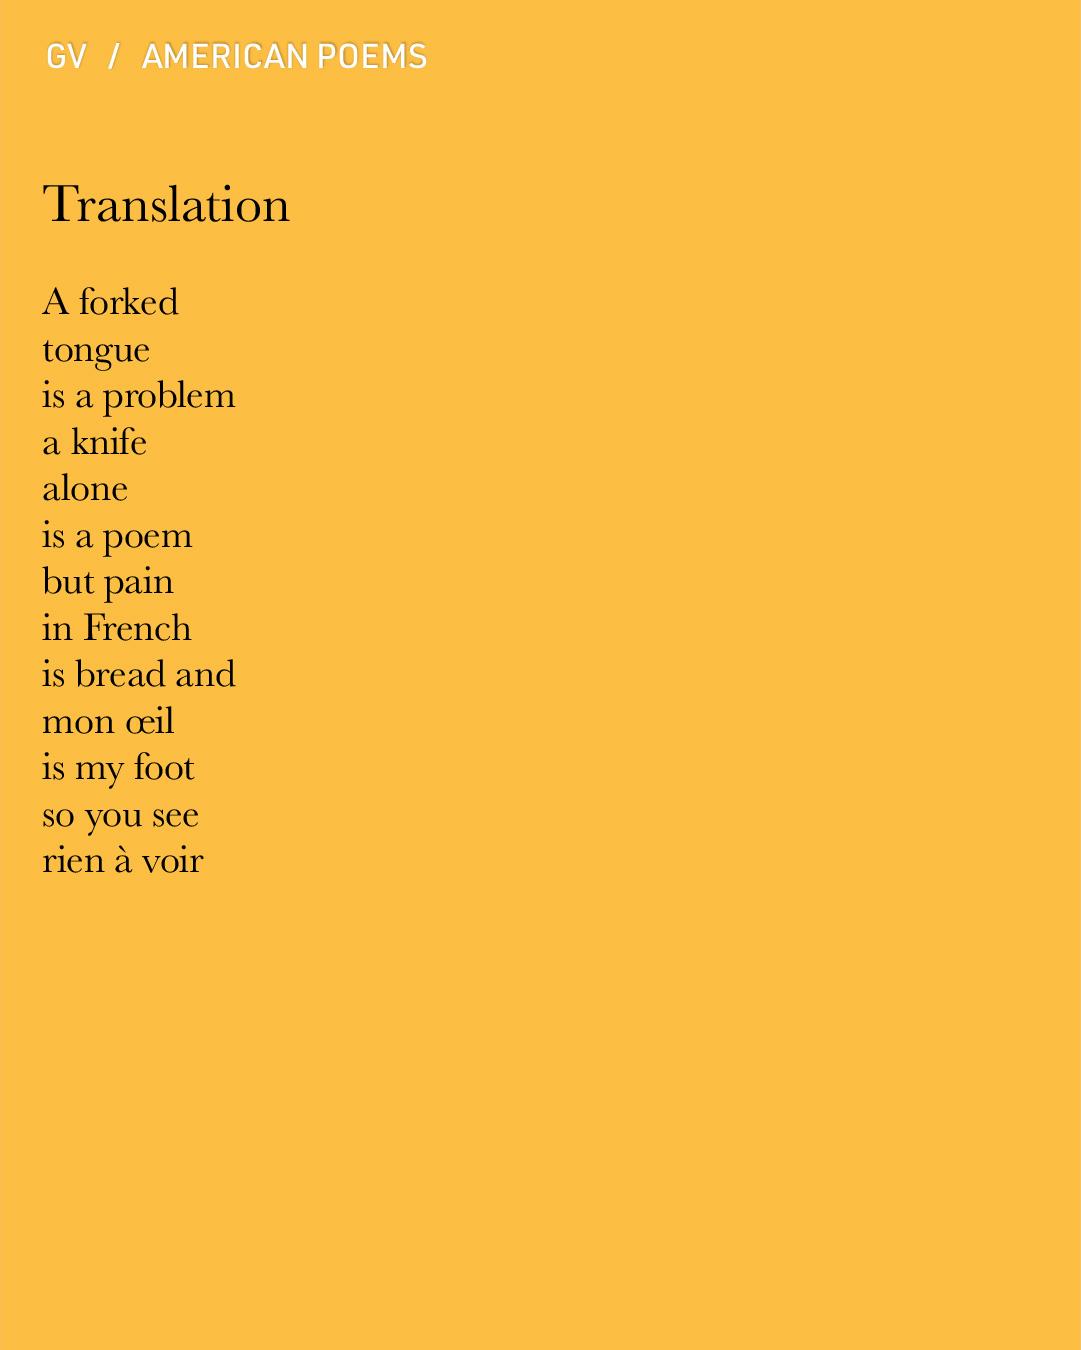 Gvion-PoemsA-Translation.jpg